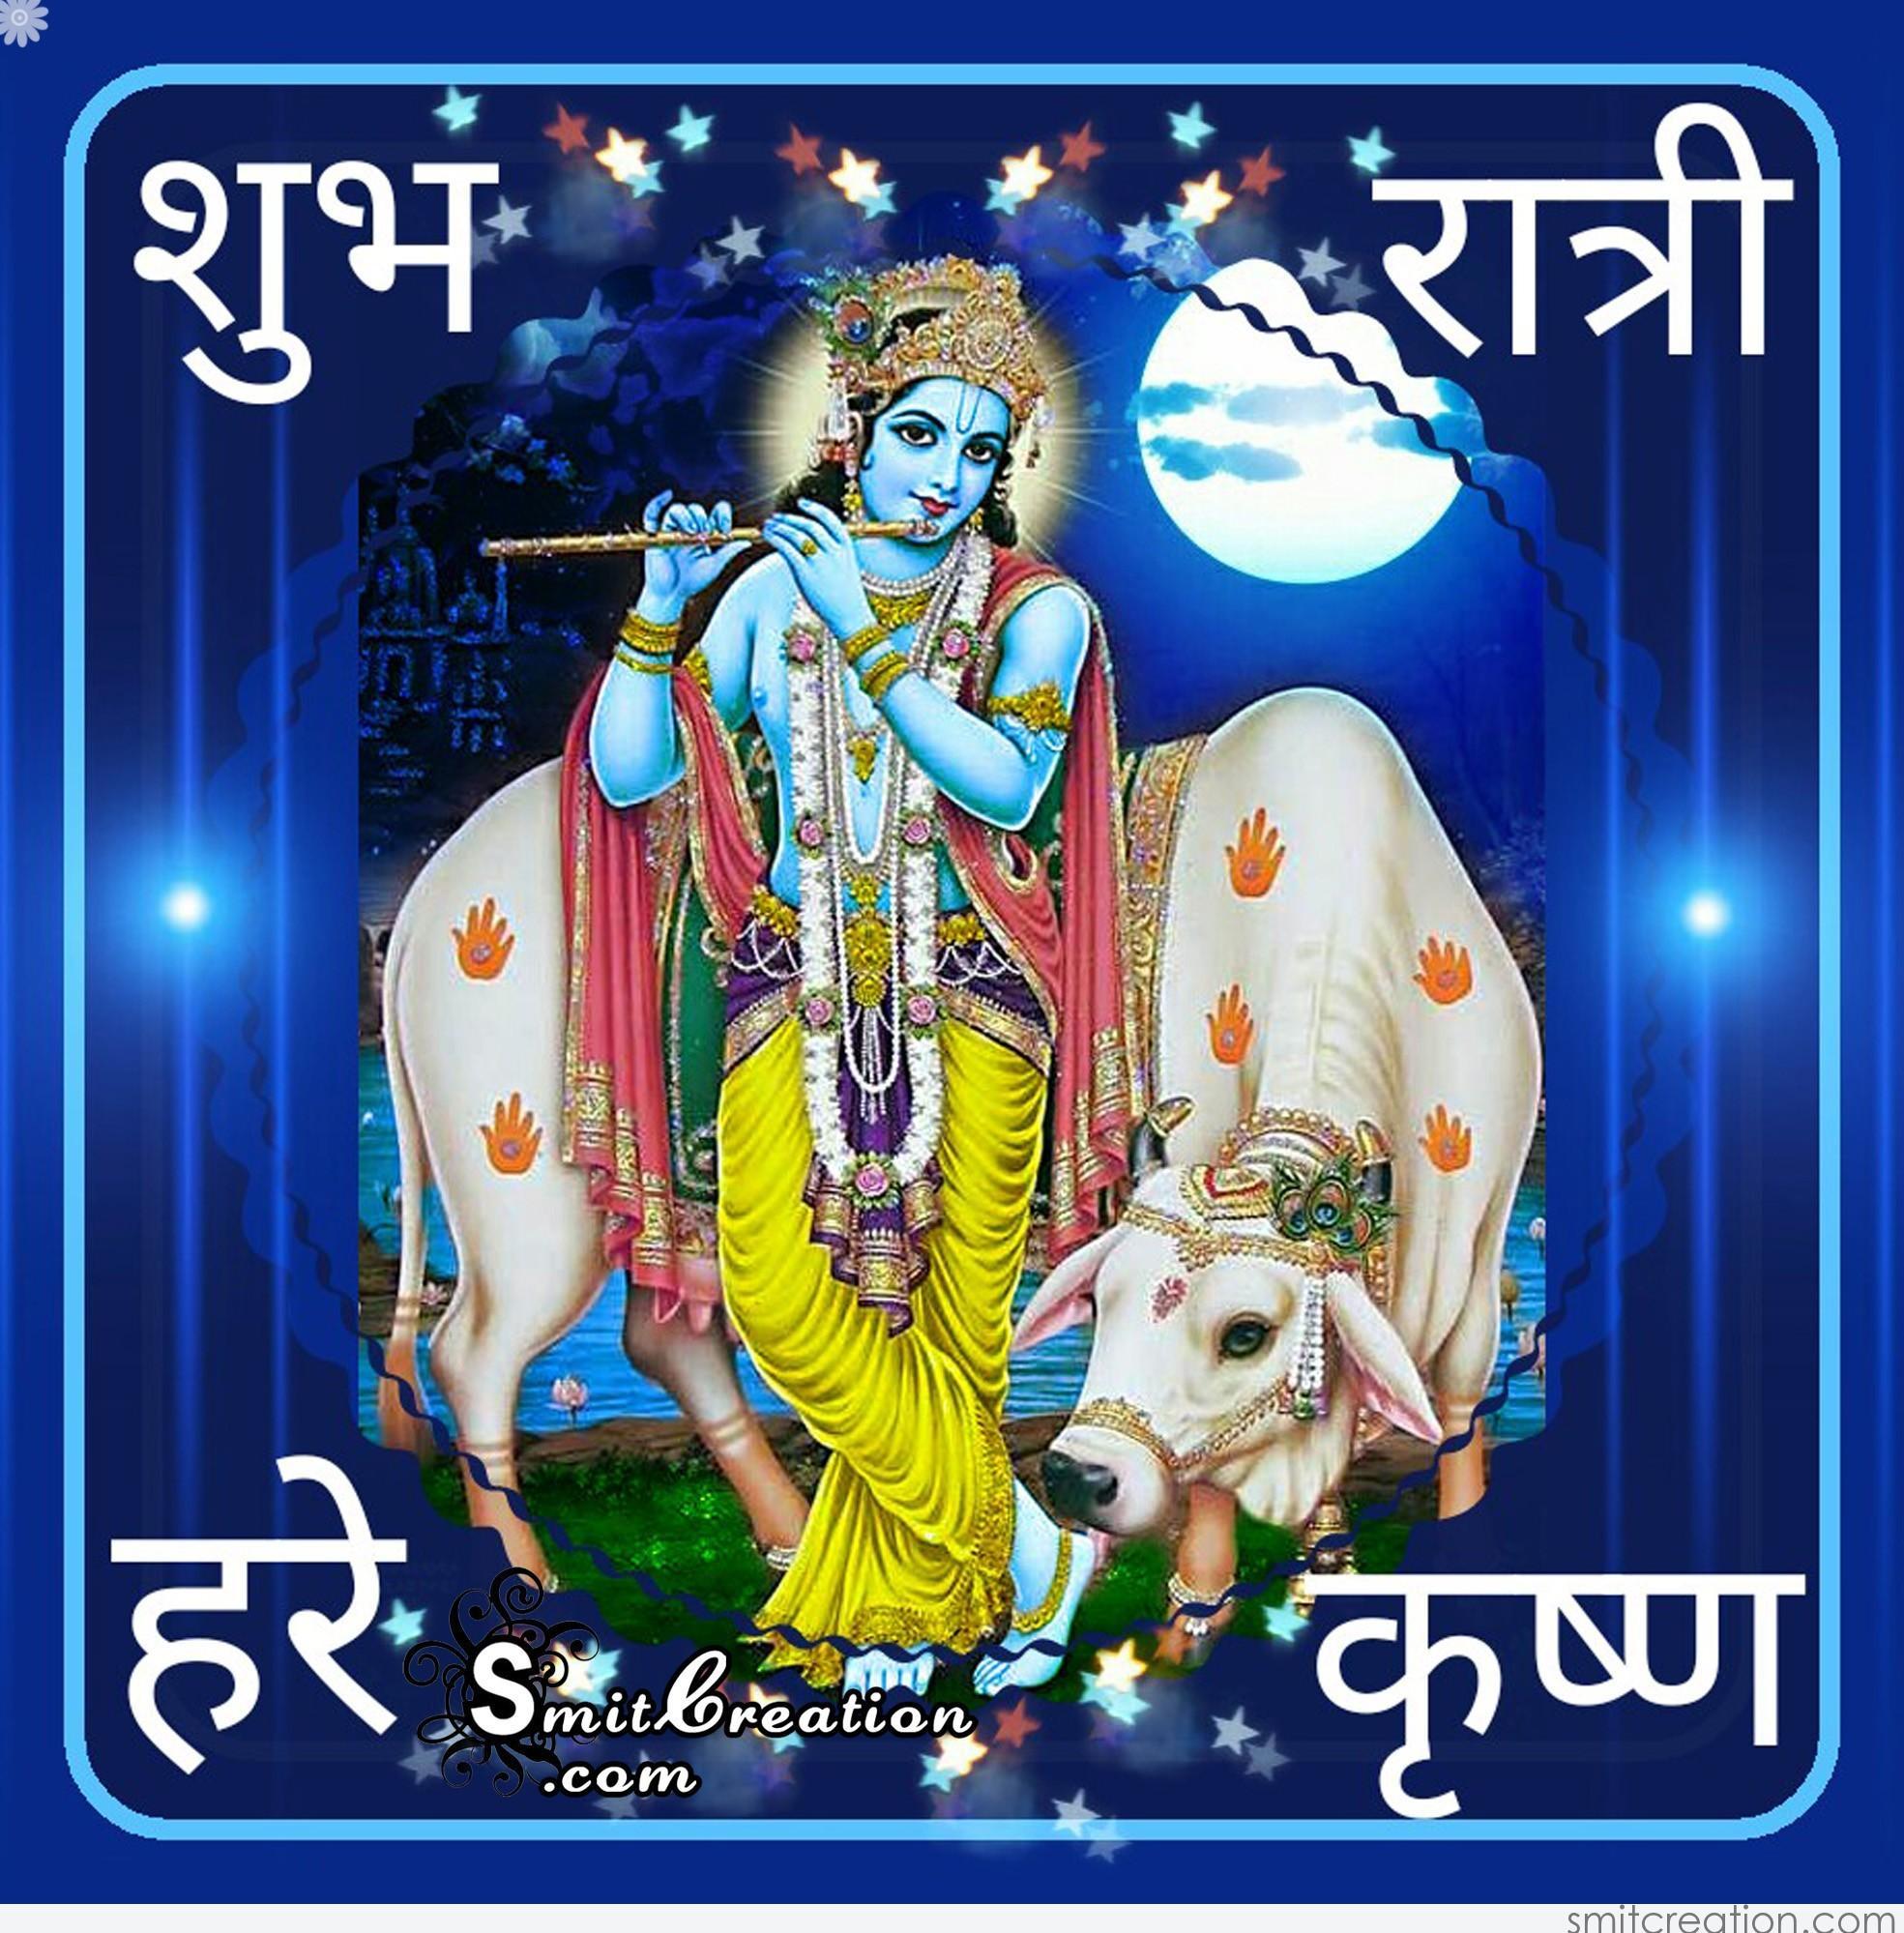 Good Morning Quotes Hindi Wallpaper Shubh Ratri Marathi God शुभ रात्री मराठी देवाचे फोटो